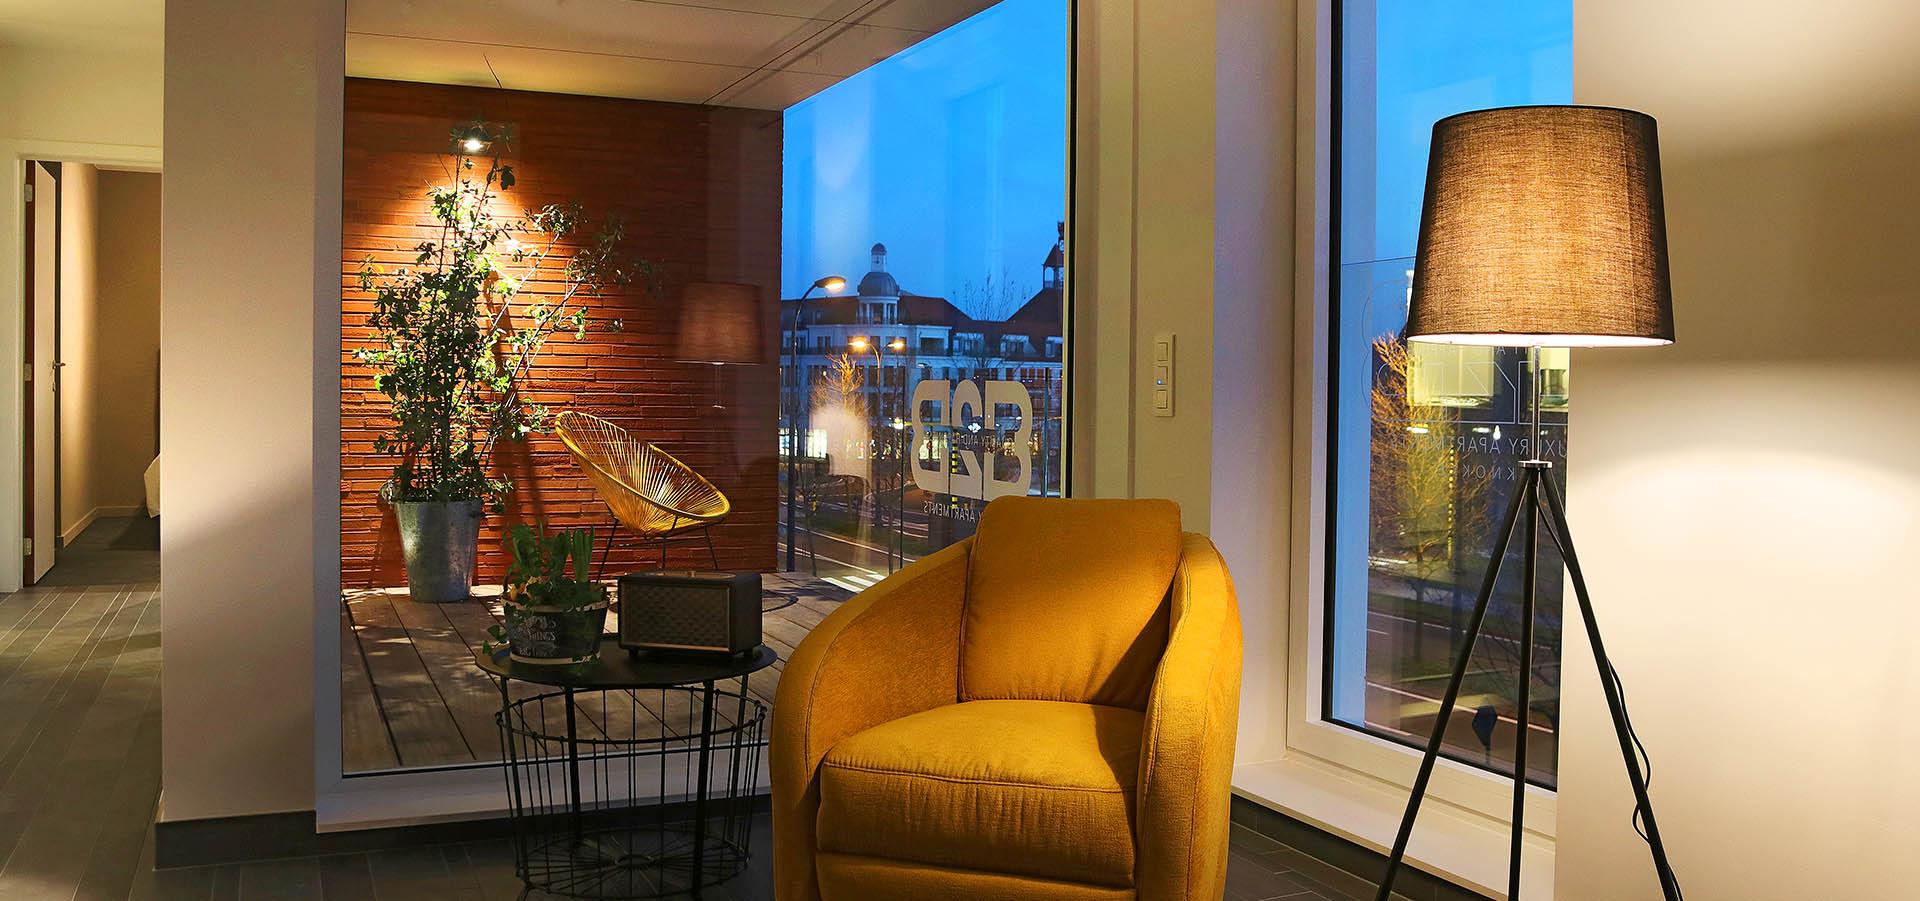 Knokke - Apt 2 Slpkmrs/Chambres - B2B Luxury apartment